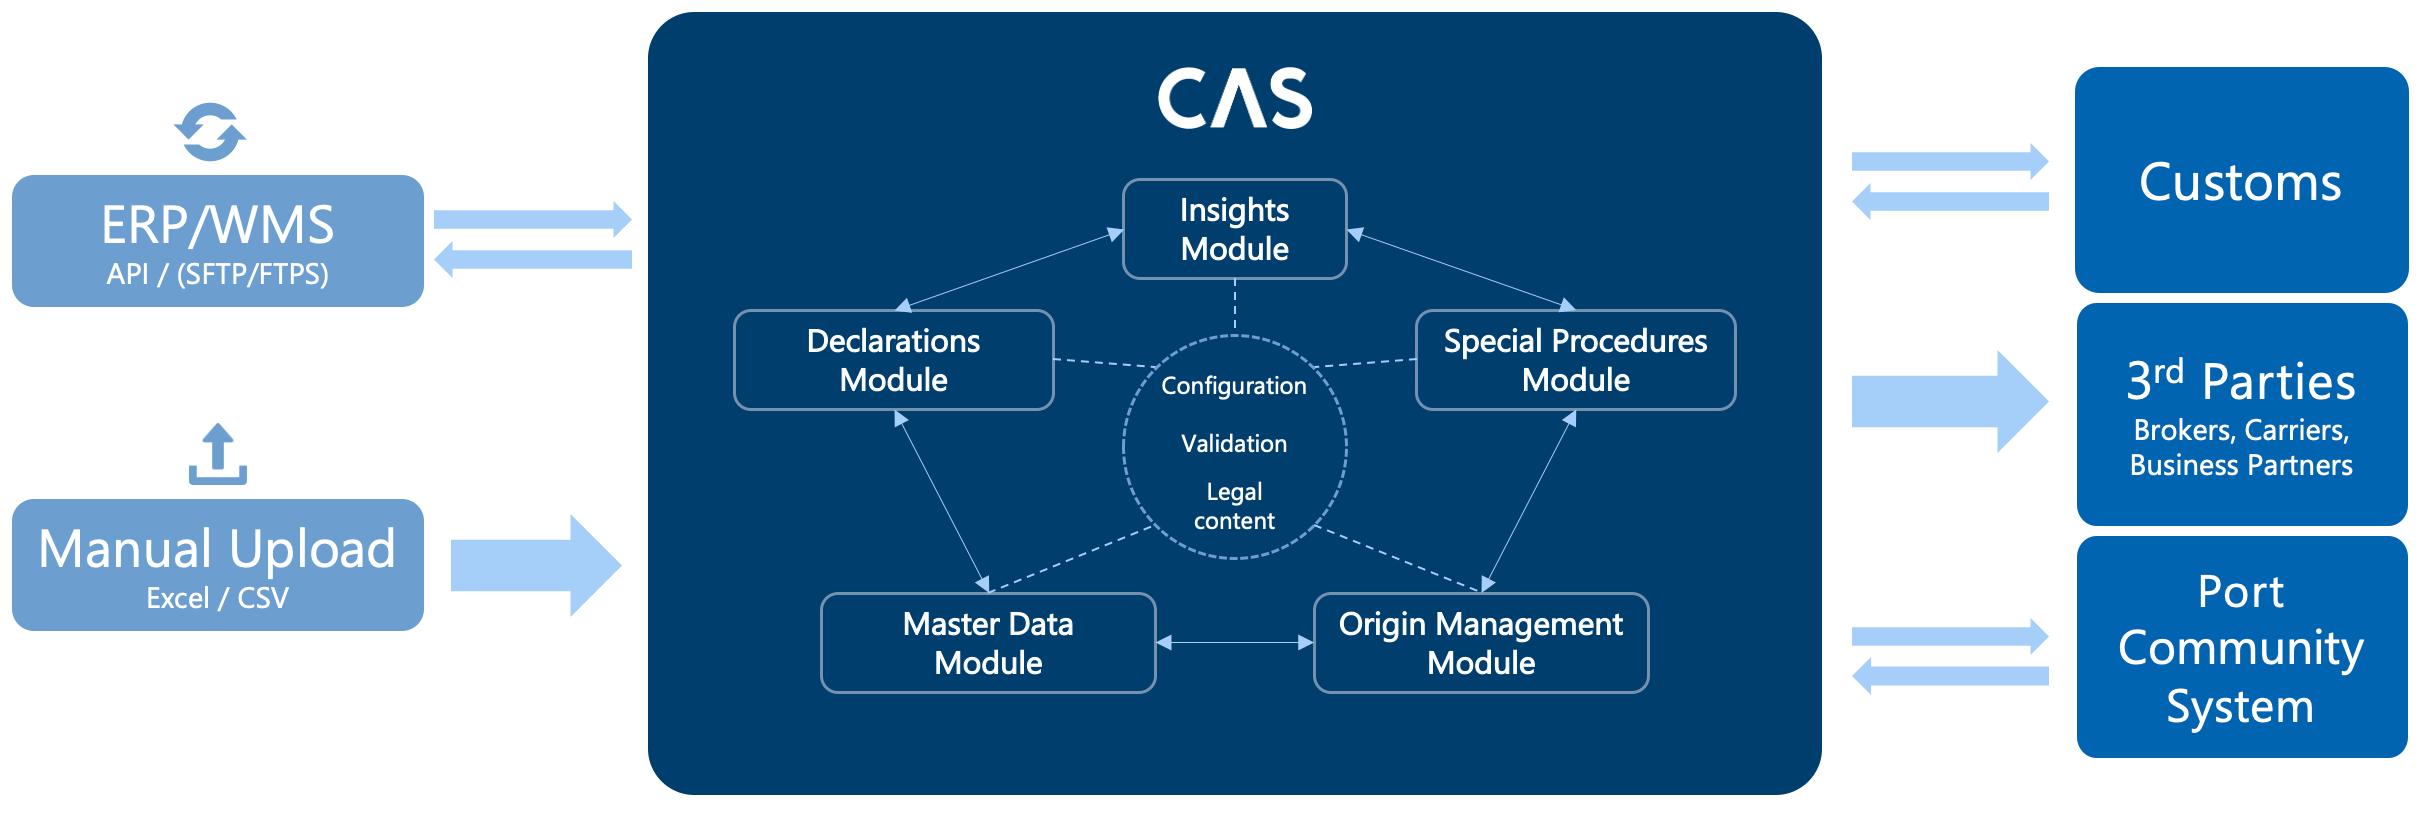 Declarations CAS